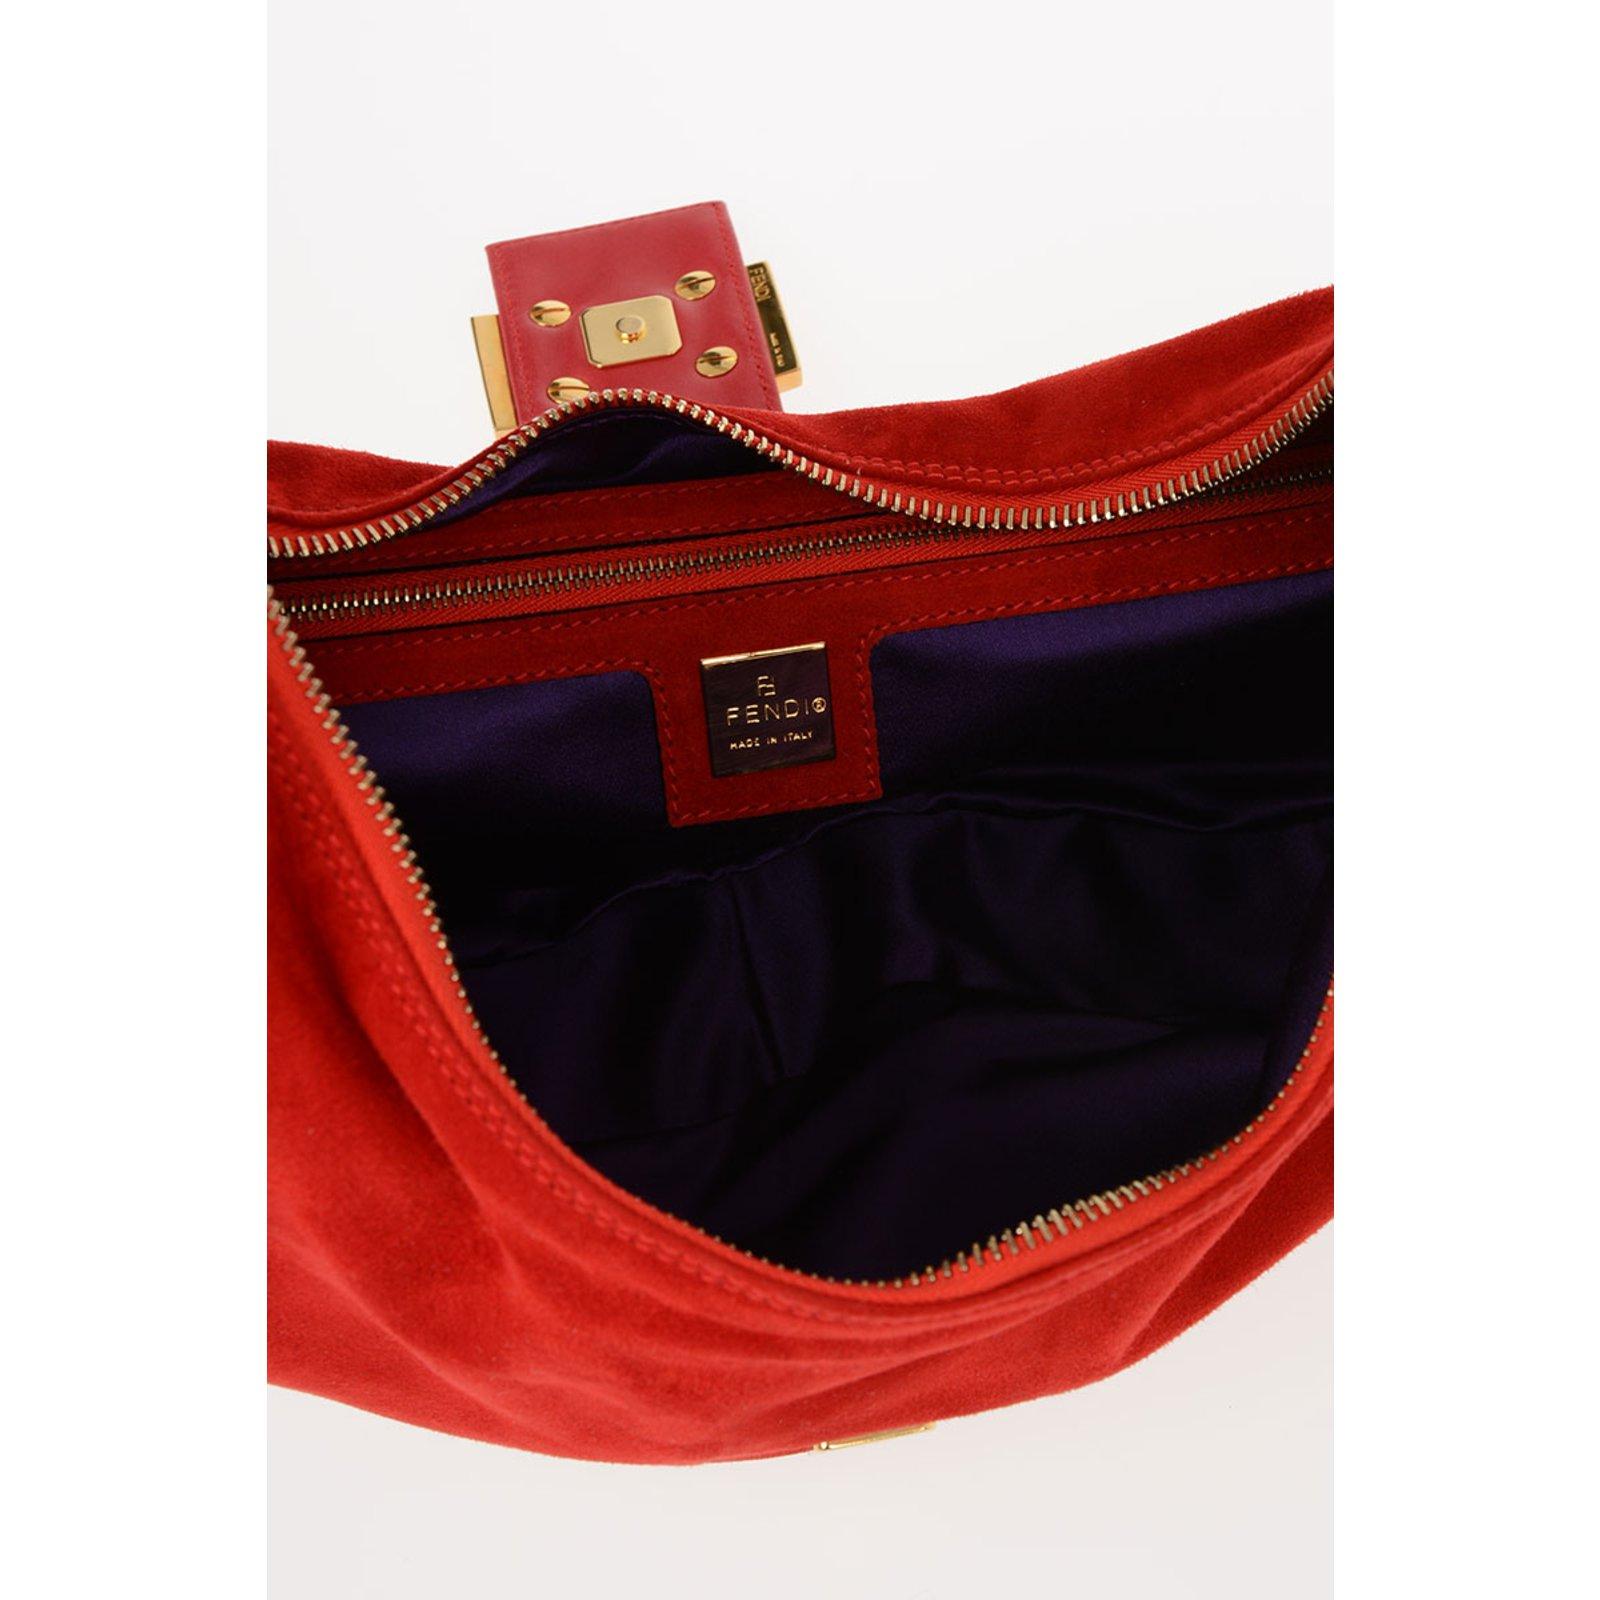 68241e5bfc6 ... Fendi Fendi suede new bag Handbags Leather Red ref.64582 - J finest  selection d0384 ...